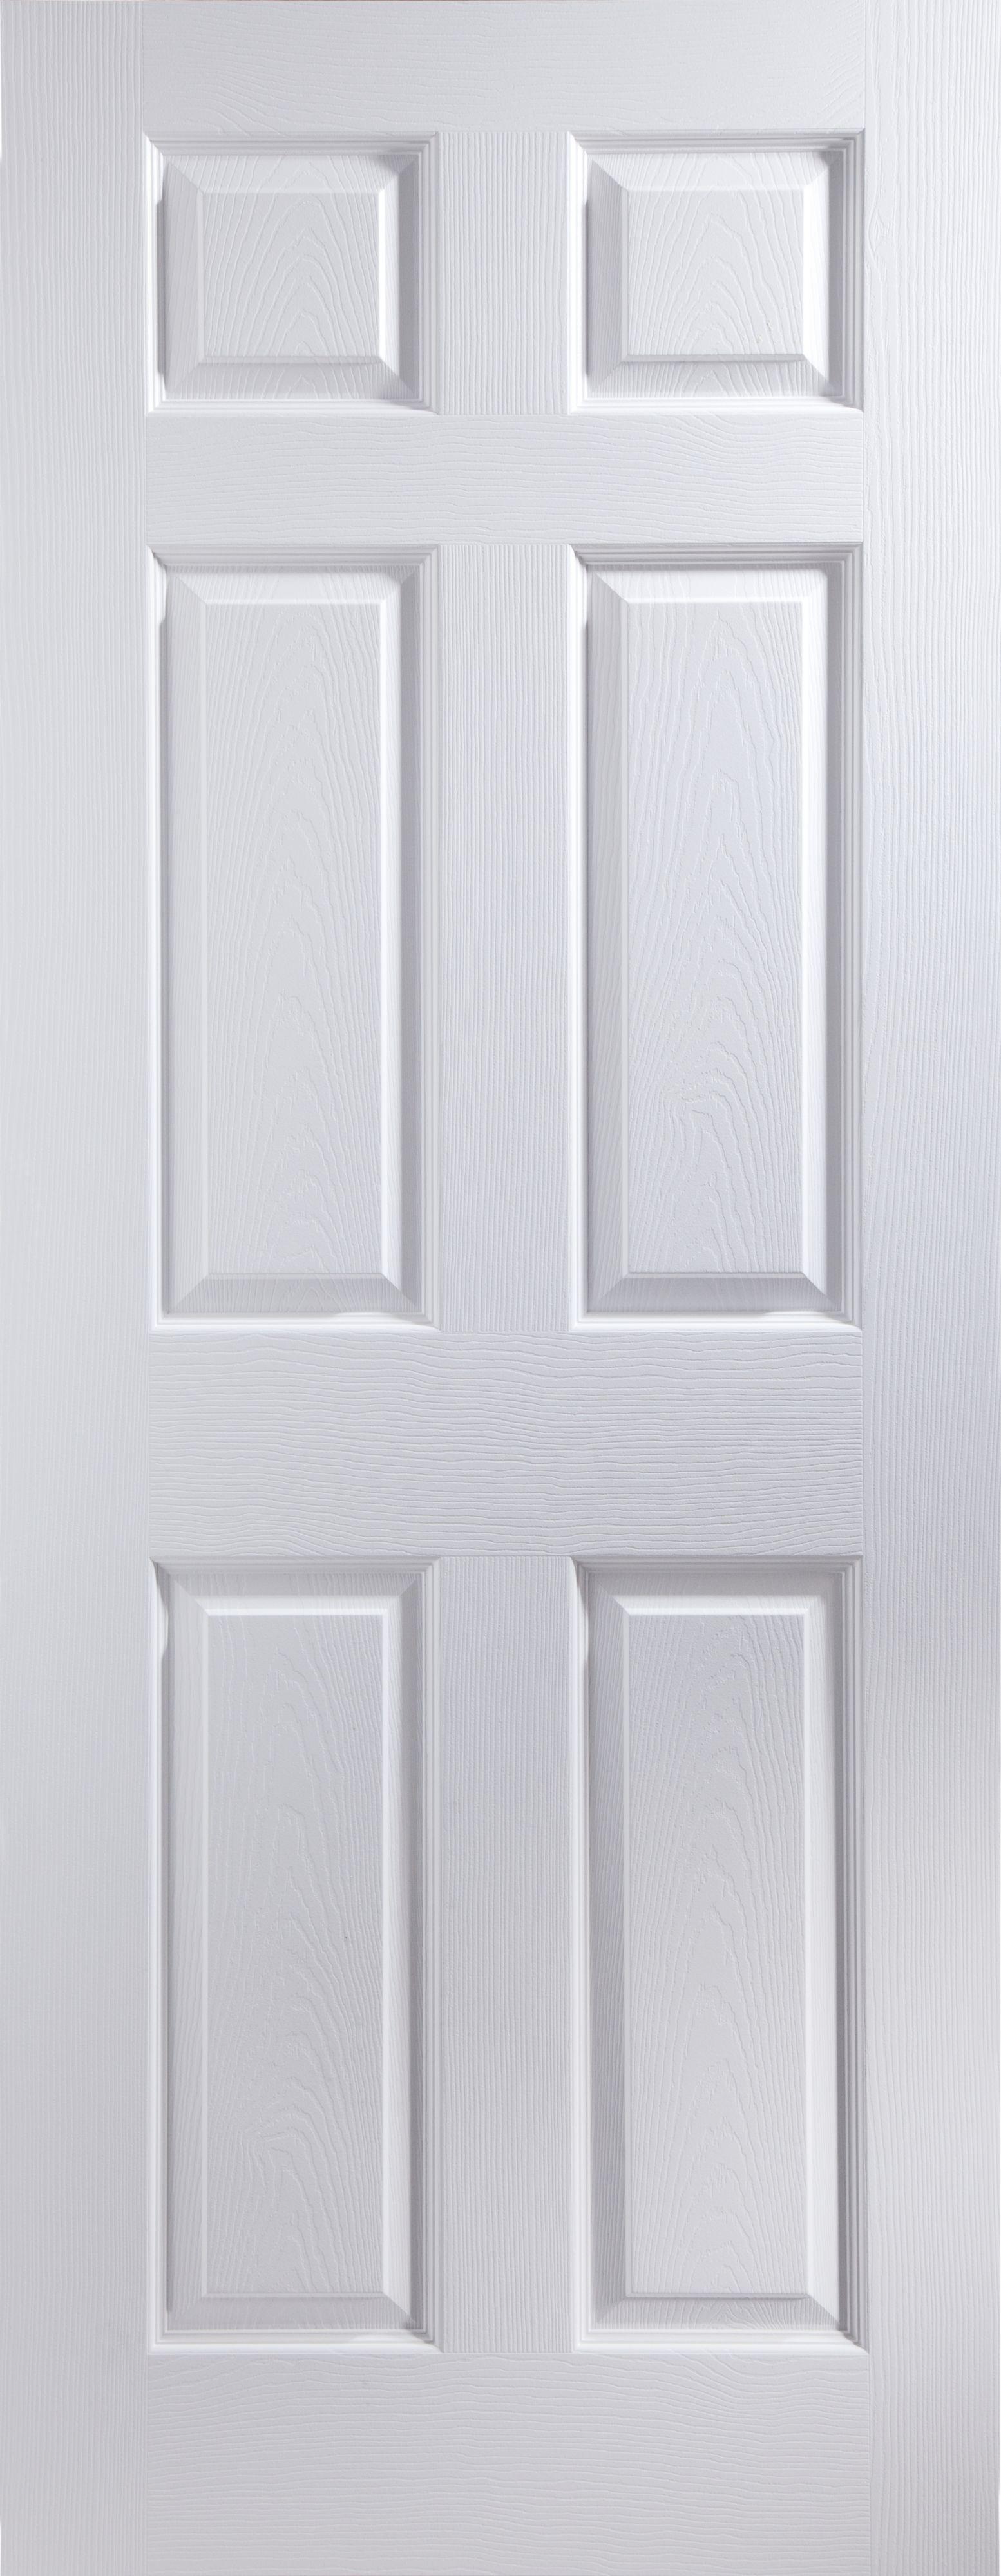 6 Panel White Woodgrain Unglazed Door Kit, (H)2040mm (W)826mm